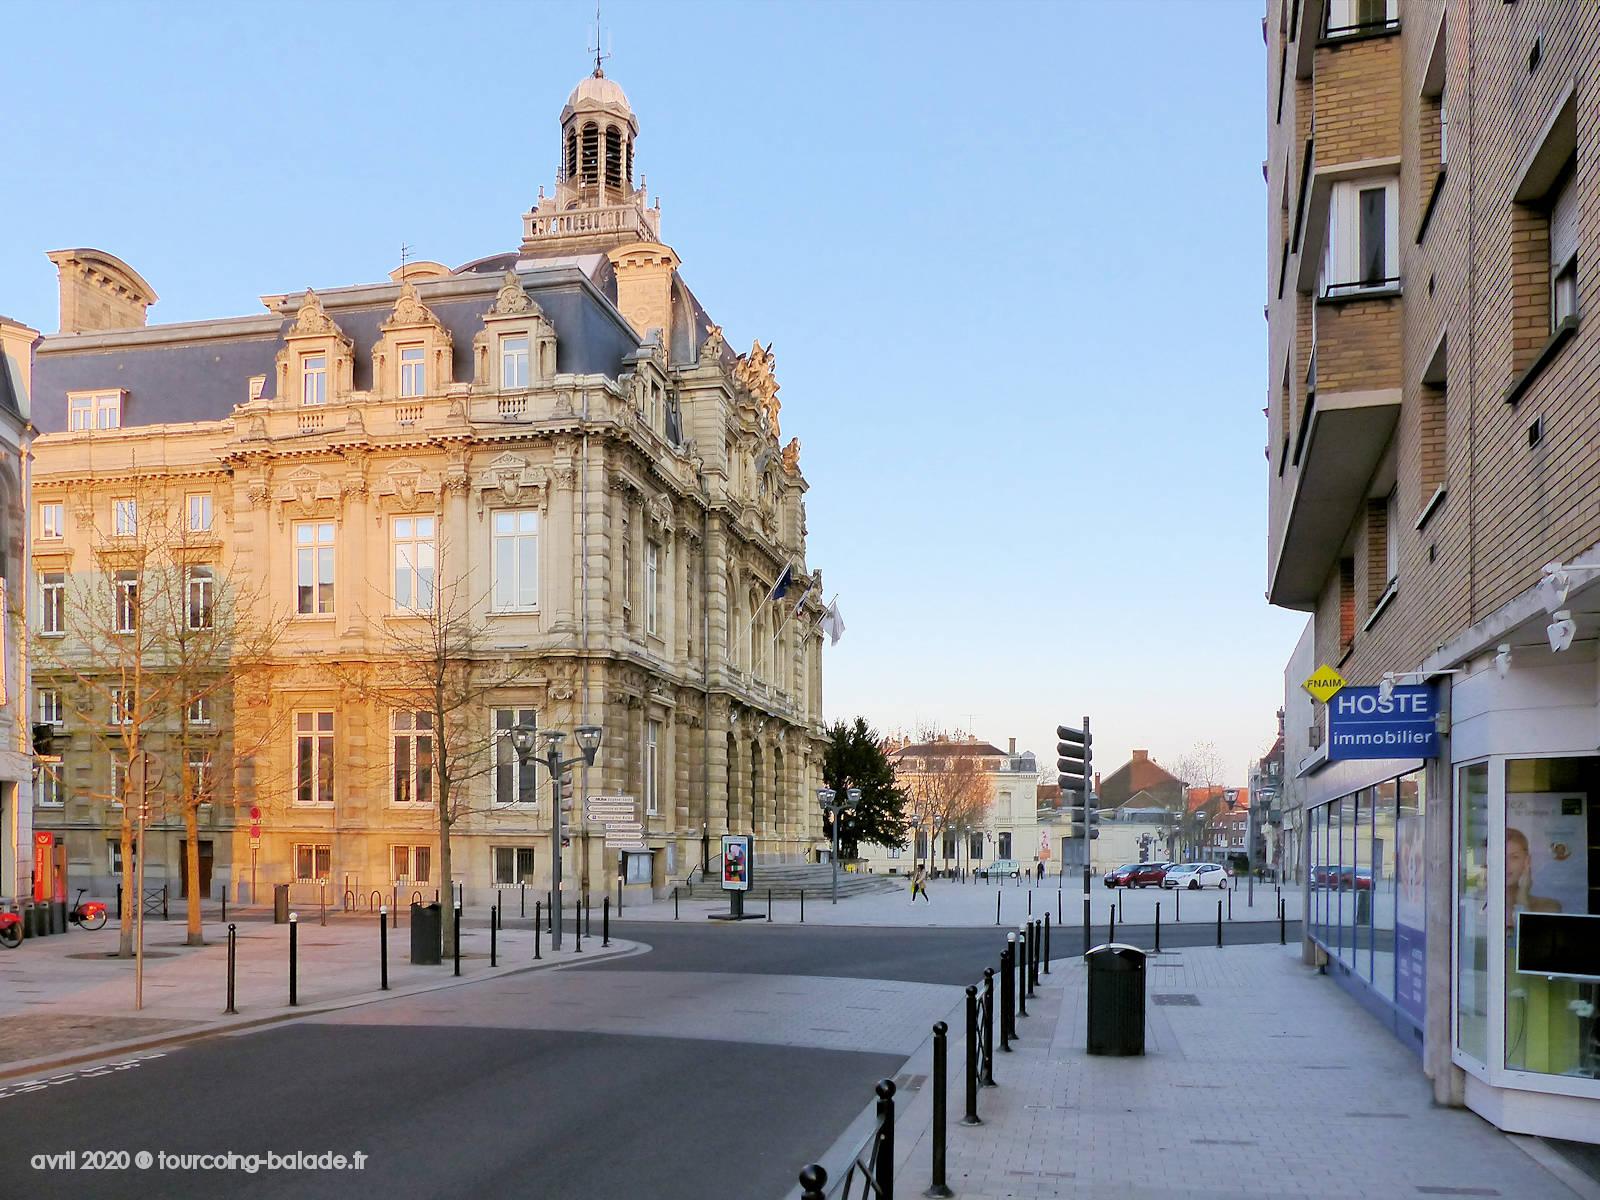 Mairie de Tourcoing, 2020 - Hoste Immobilier